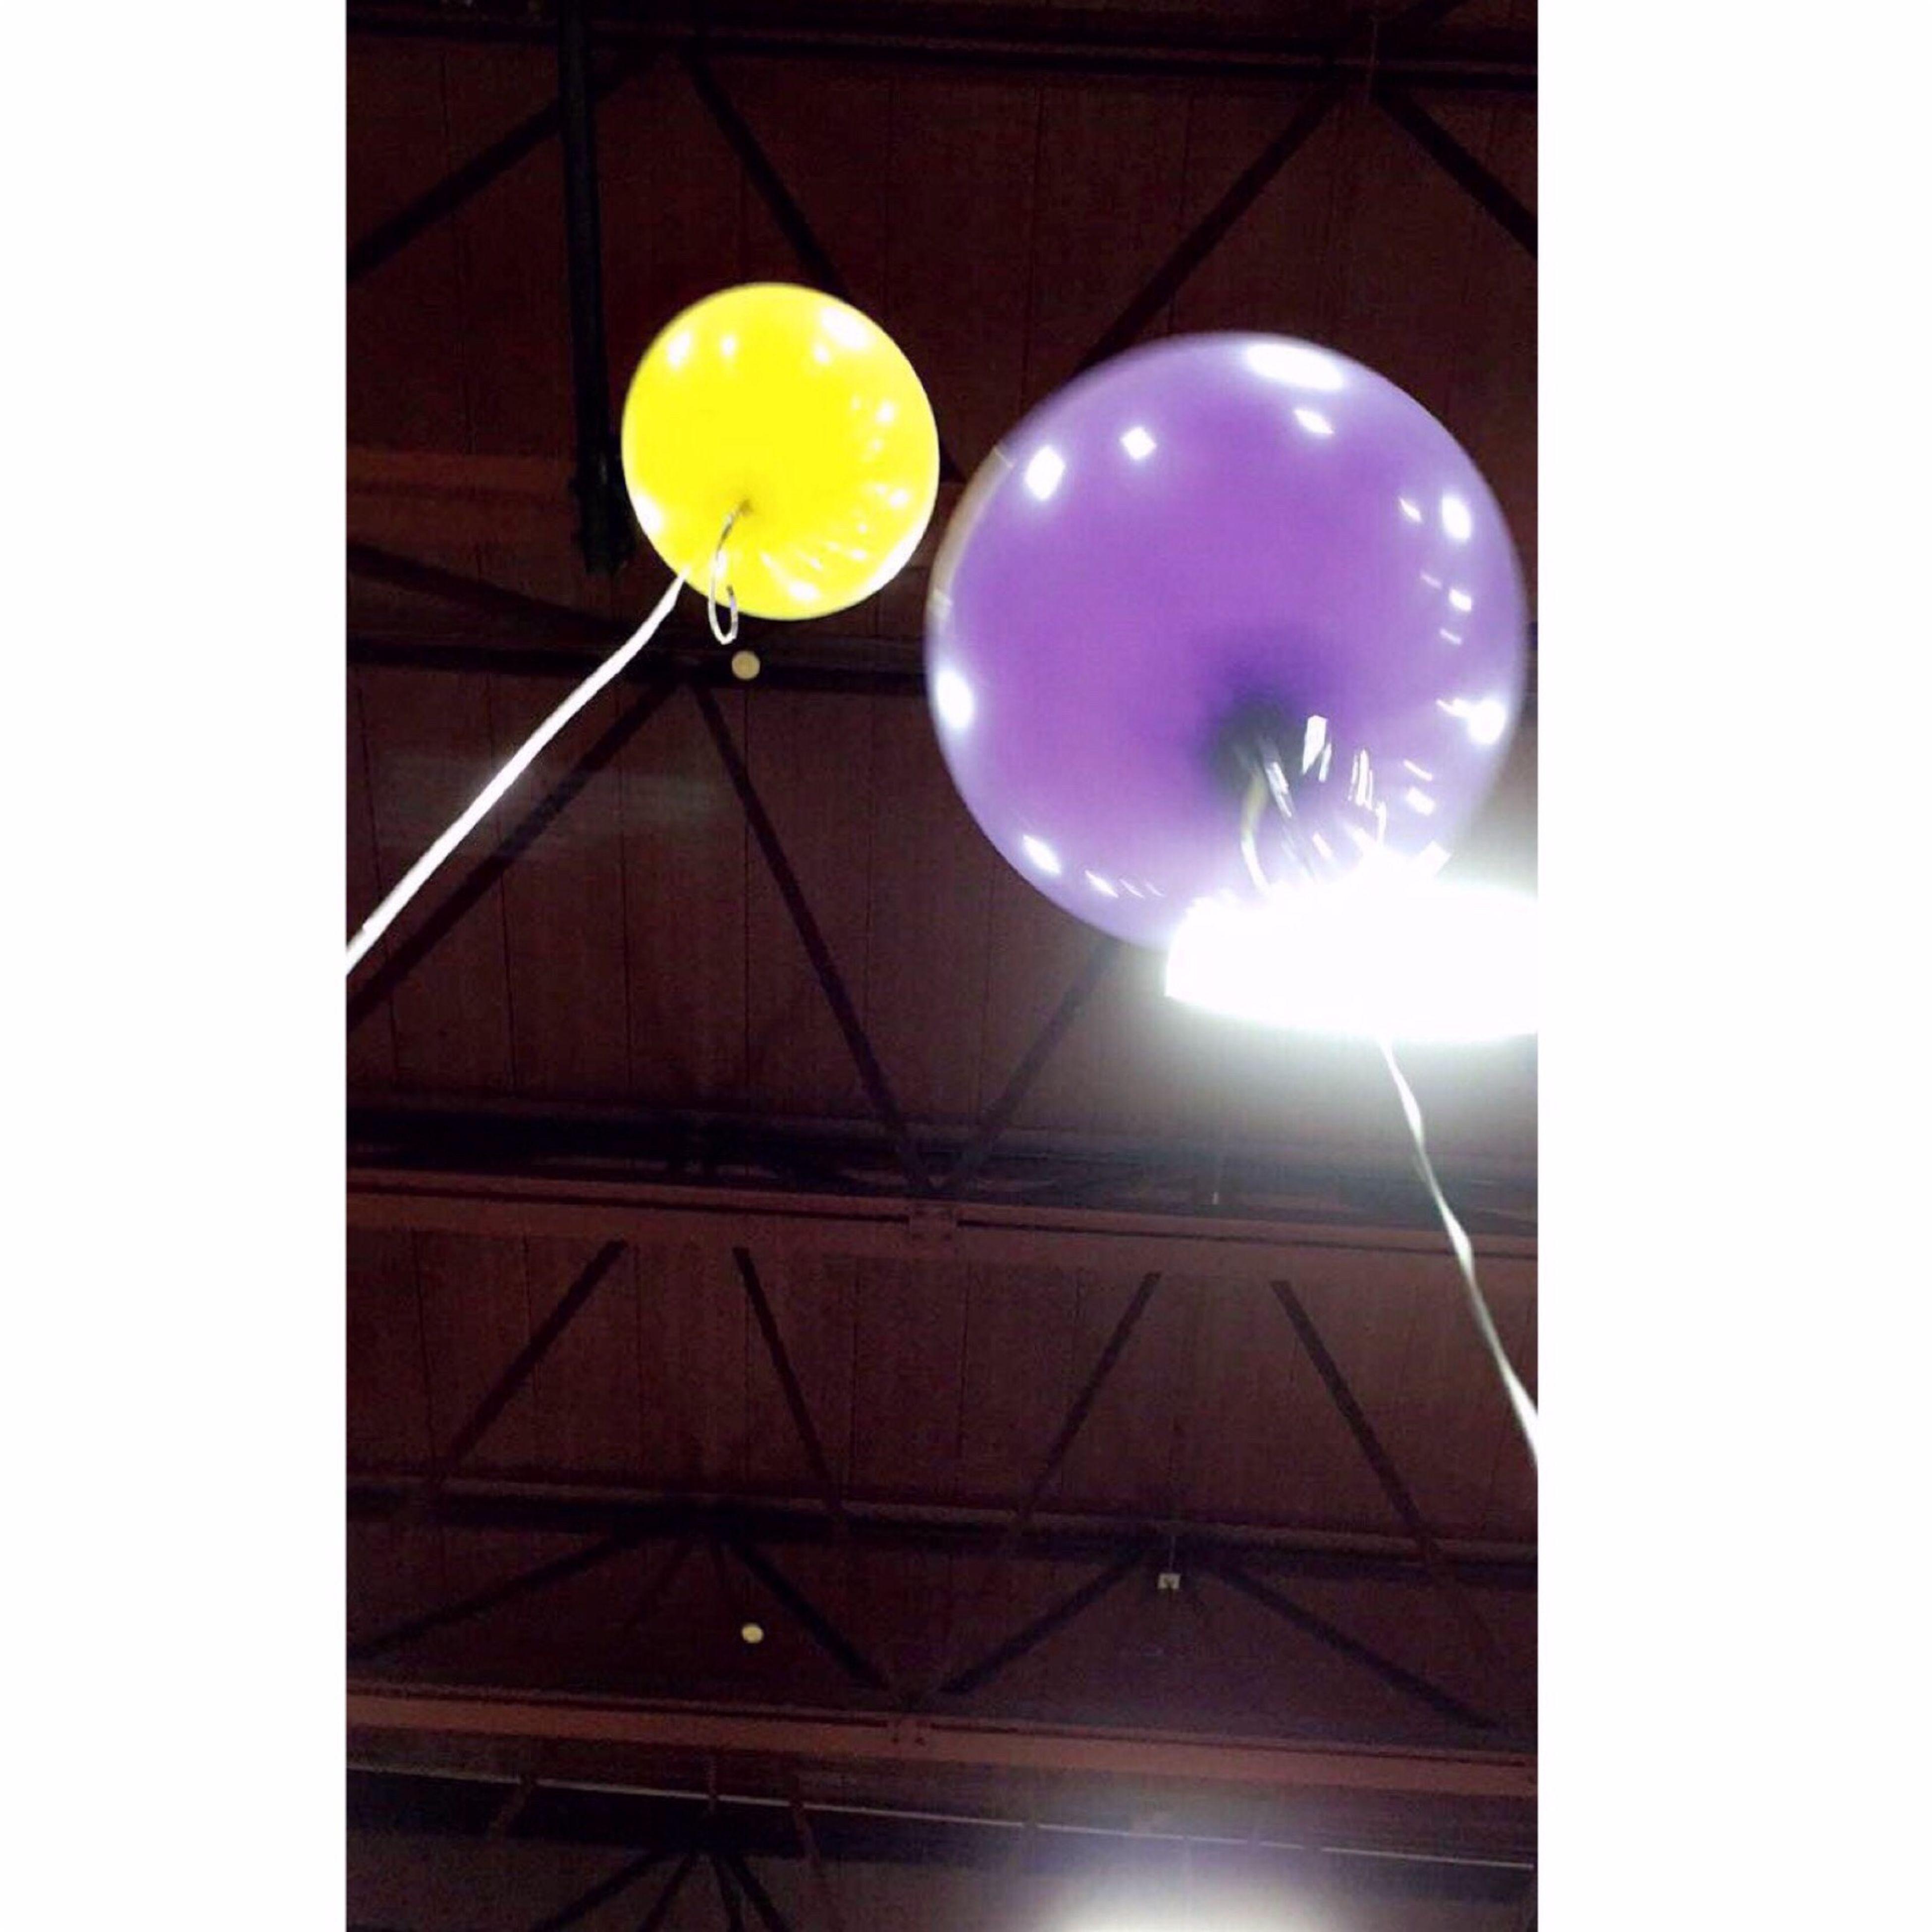 balloon, low angle view, no people, illuminated, helium balloon, indoors, architecture, night